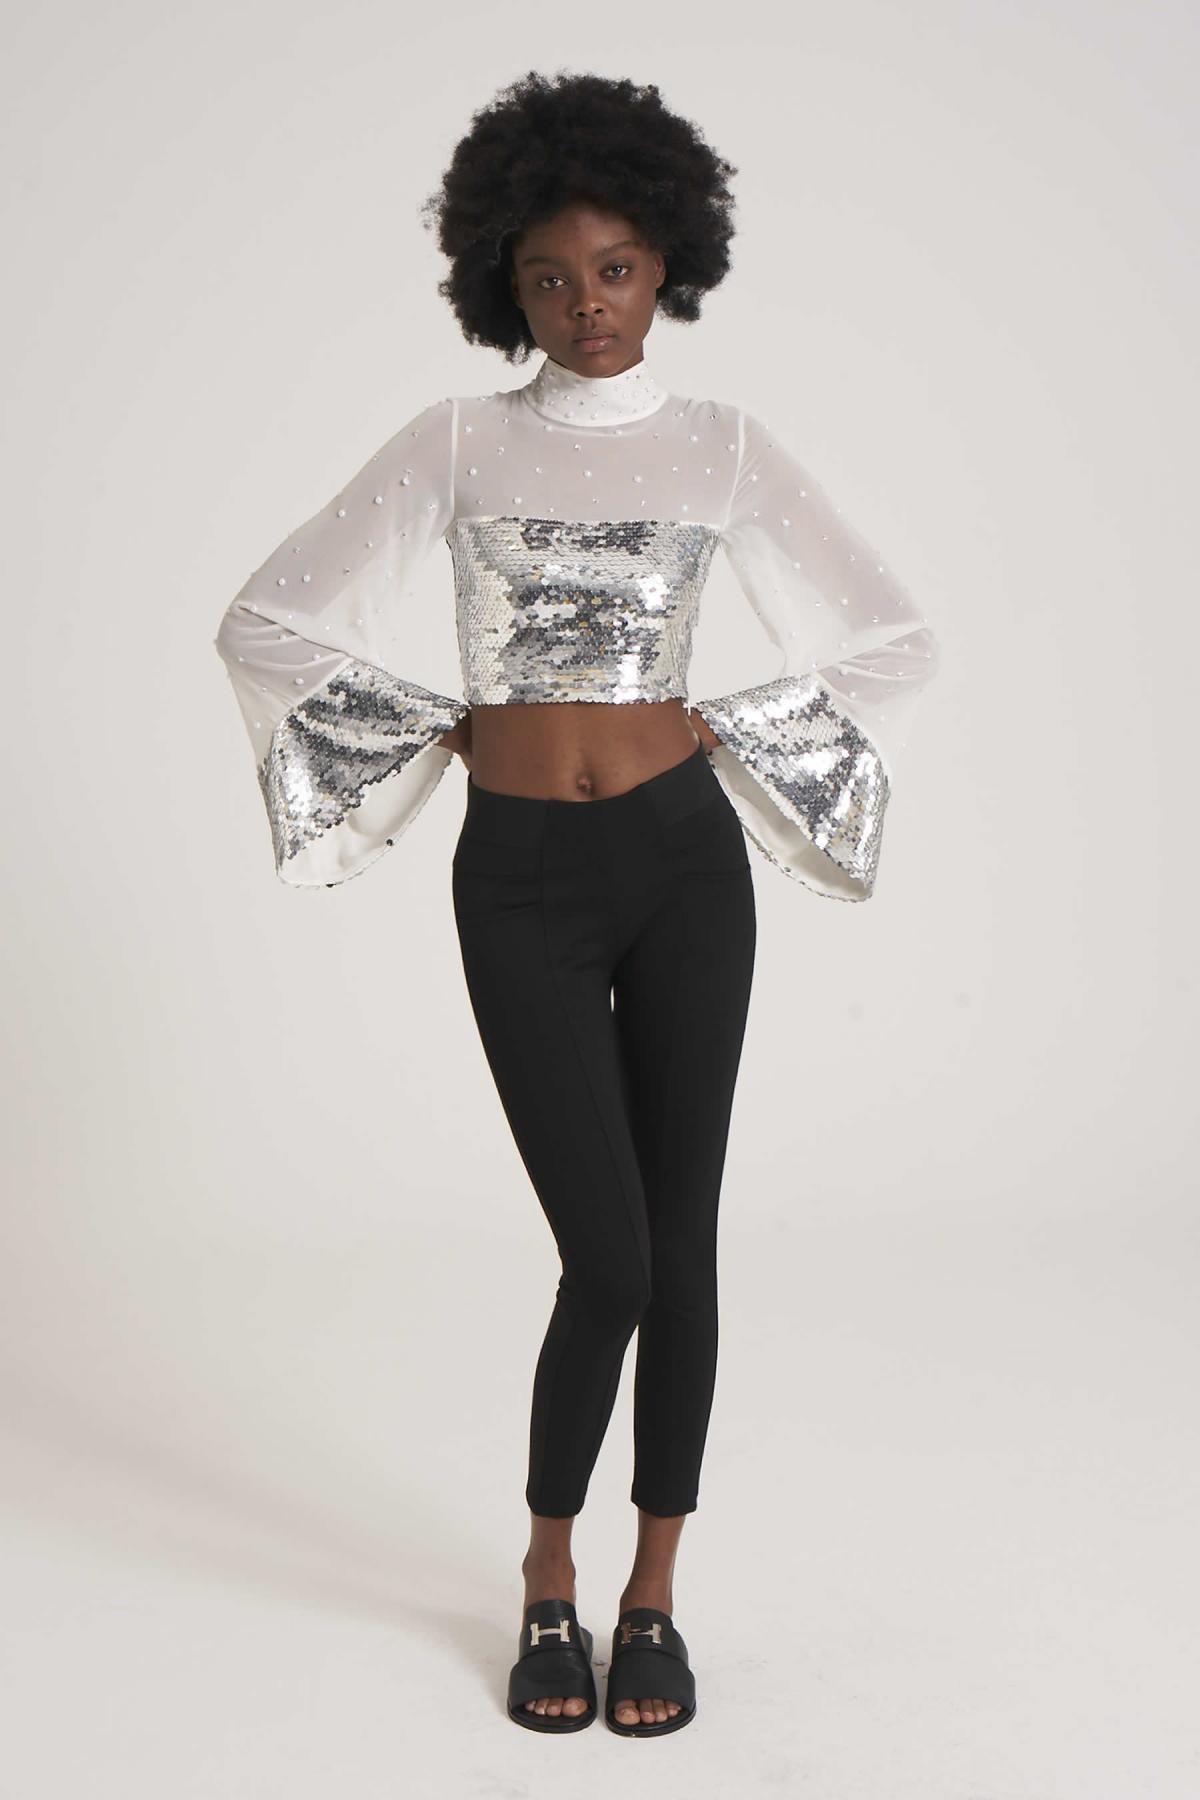 Slim Fit 70% Viscose Trousers newces-1012-B